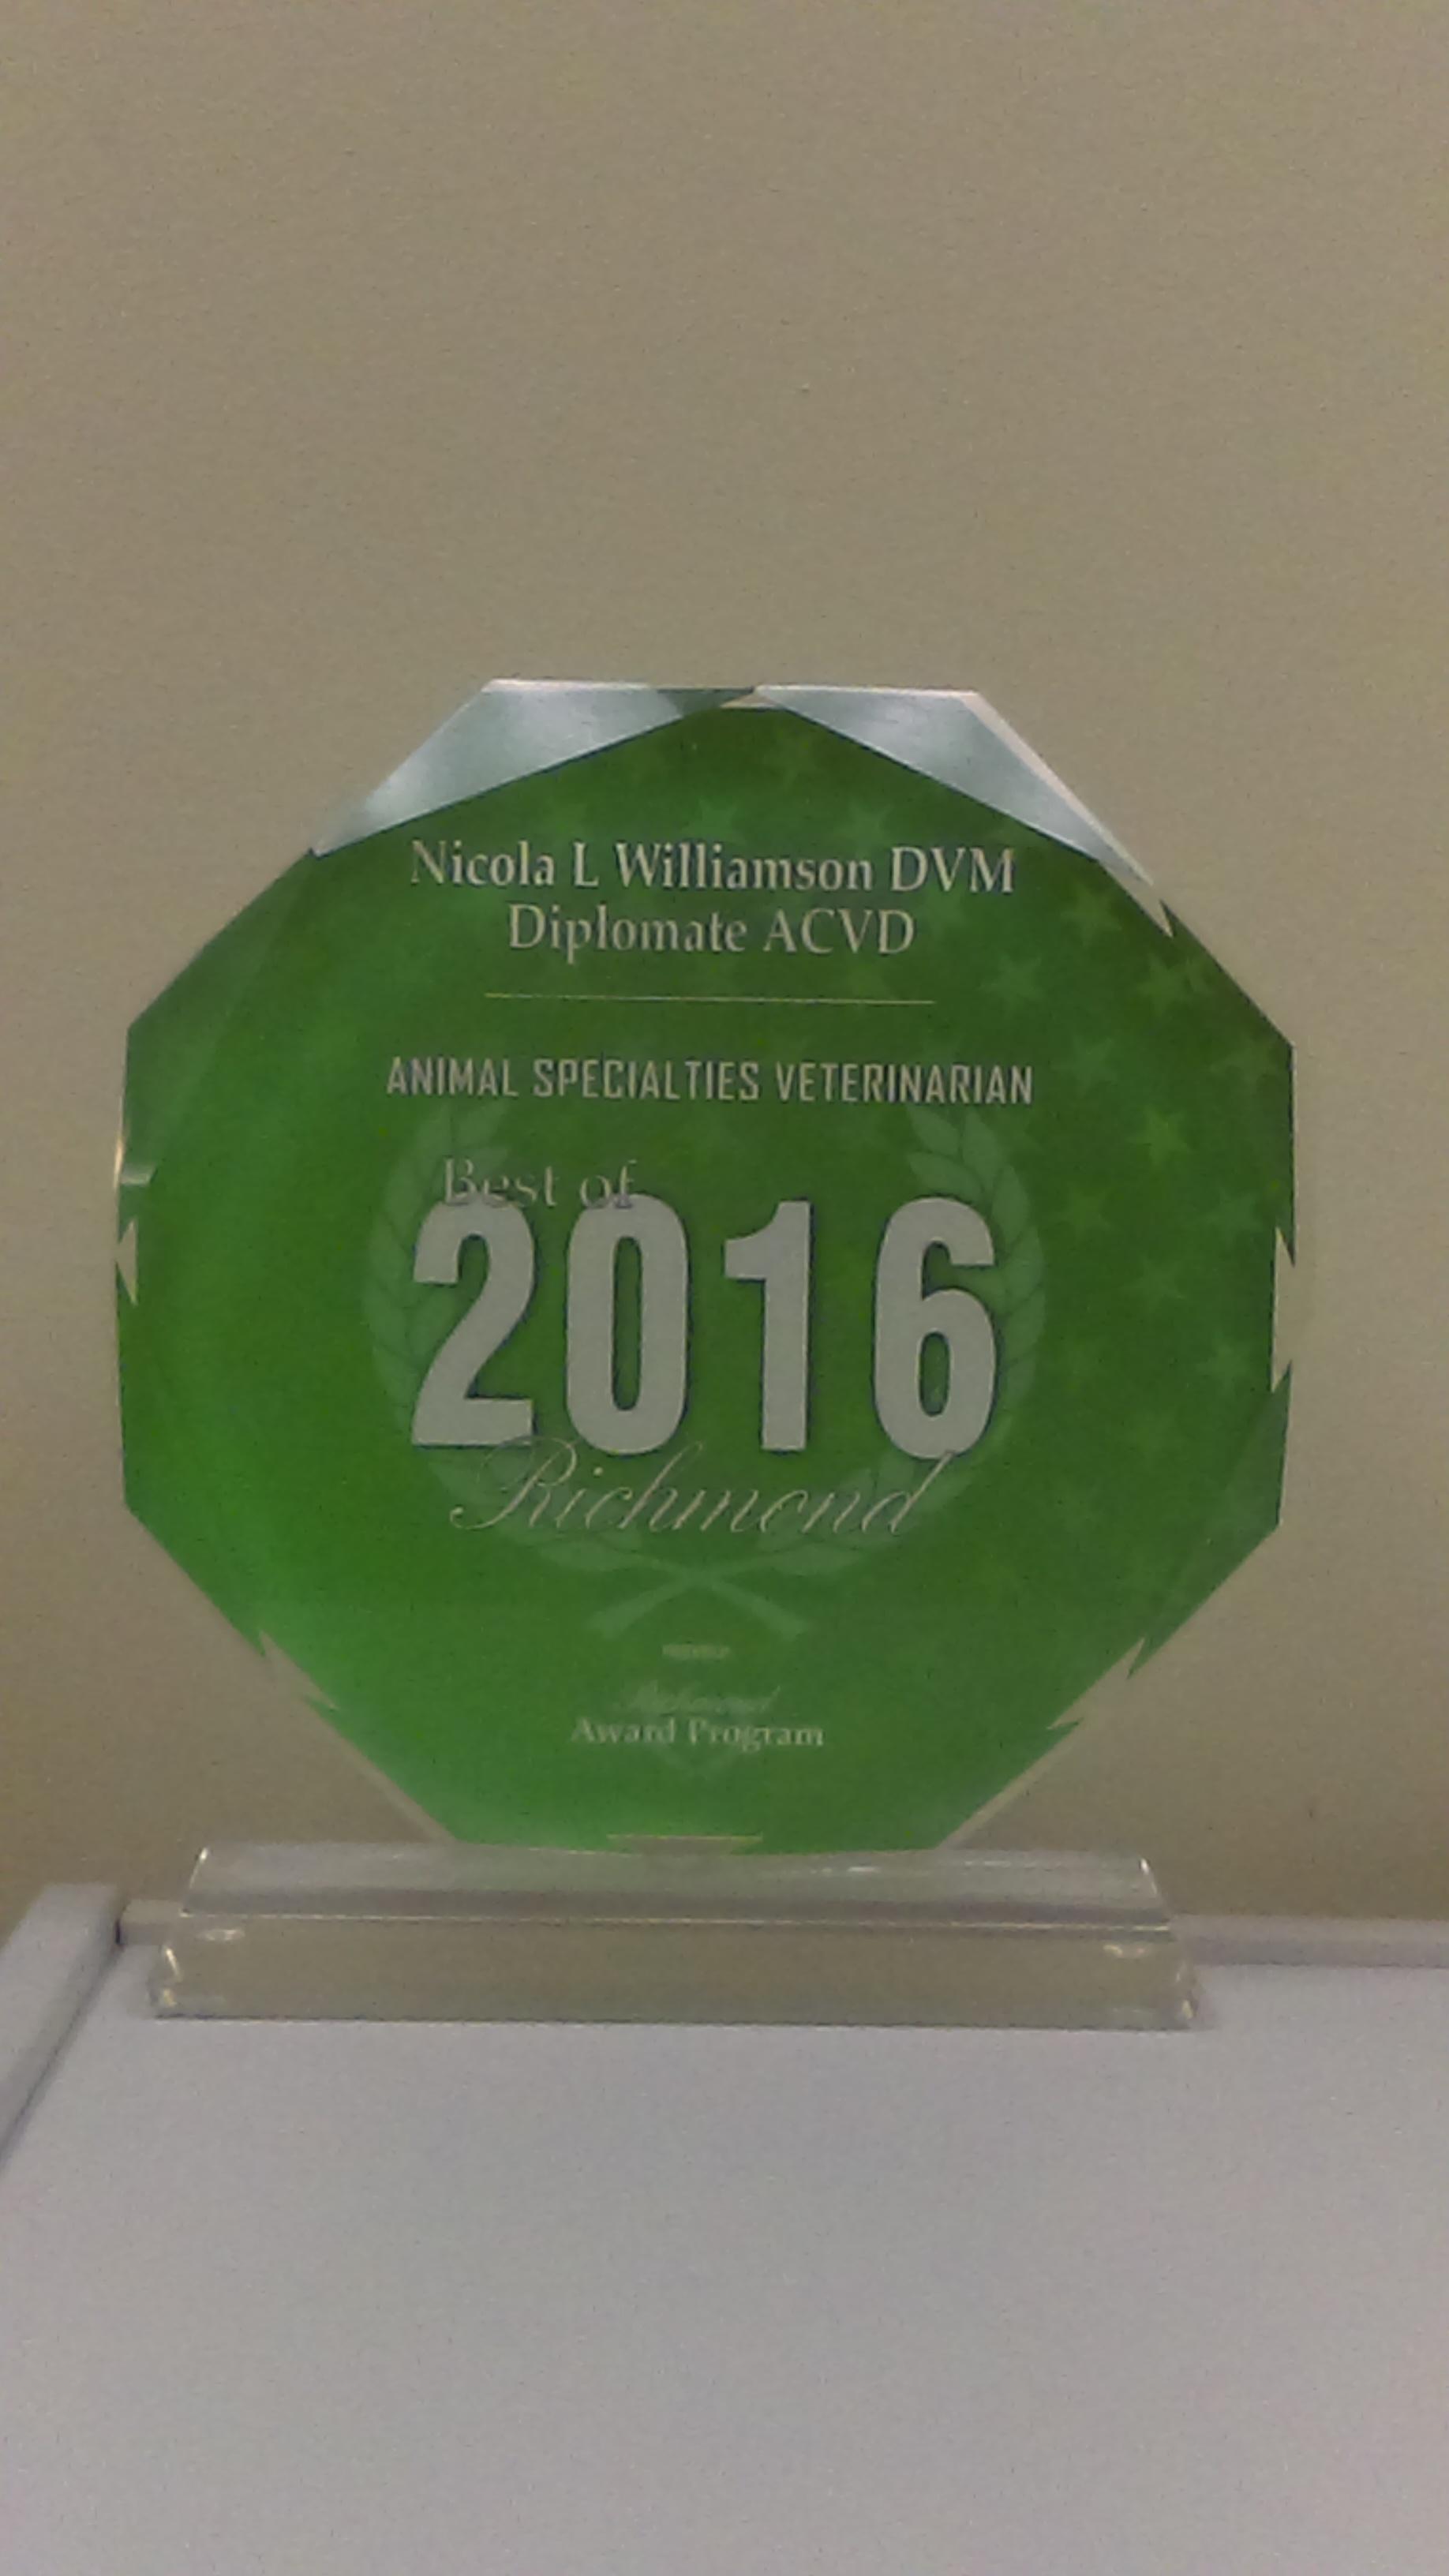 2016 Animal Specialties Veterinarian Award to Dr. Nicola Williamson